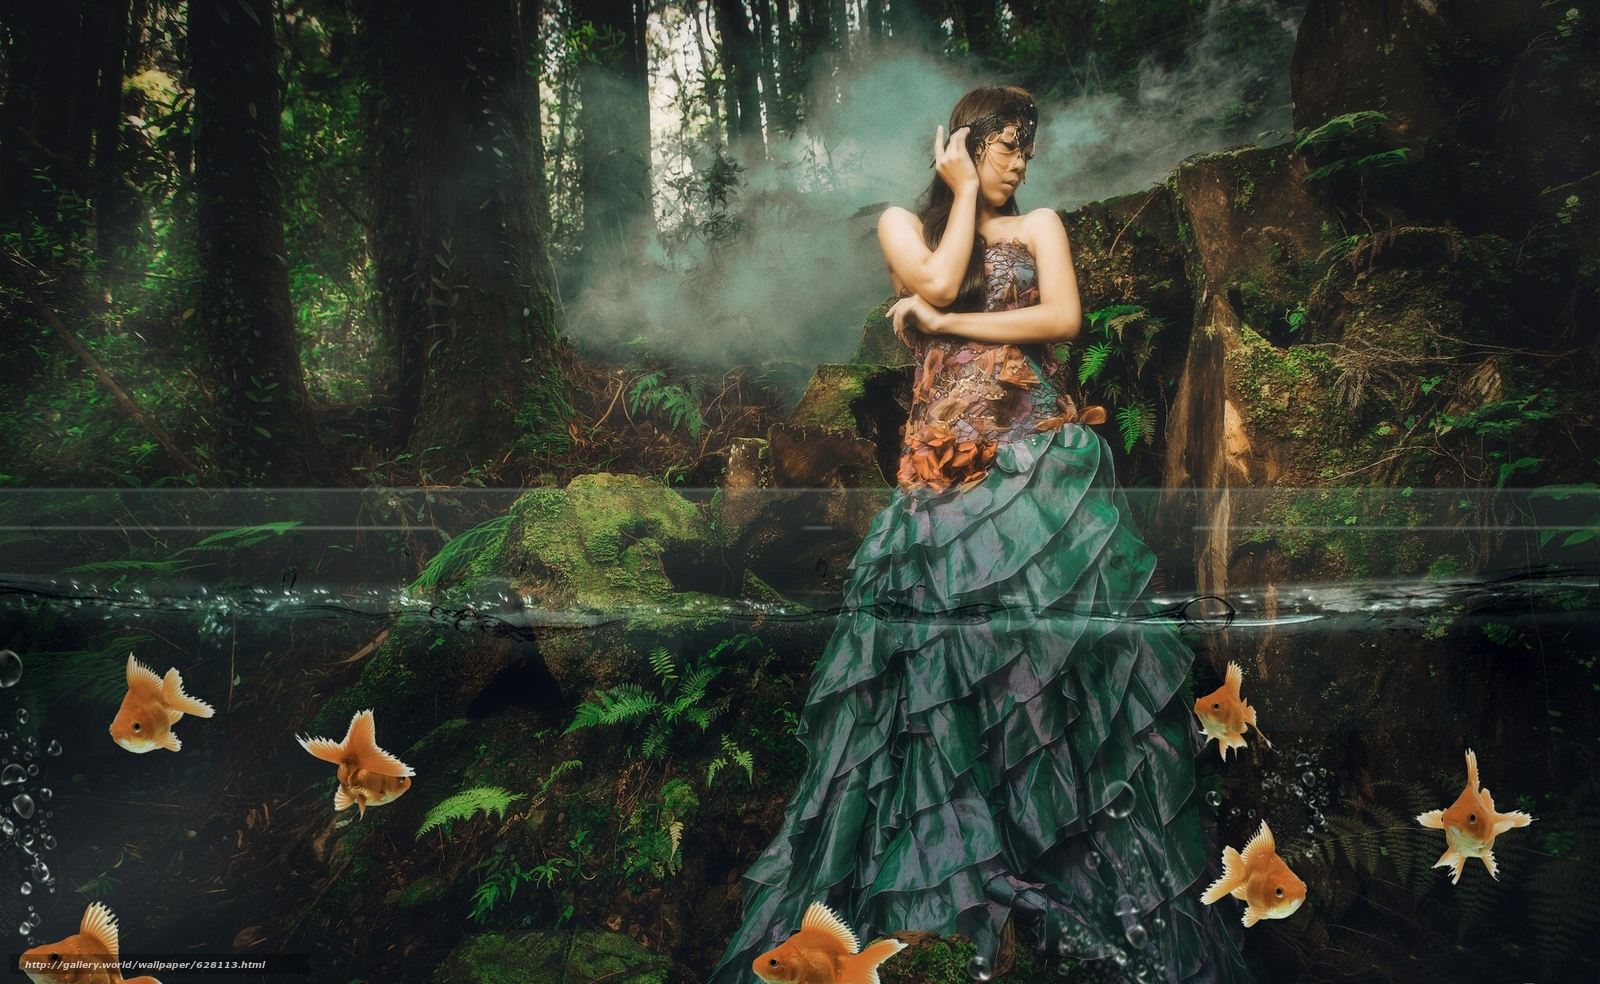 девушка, азиатка, платье, рыбки, вода, лес, ситуация